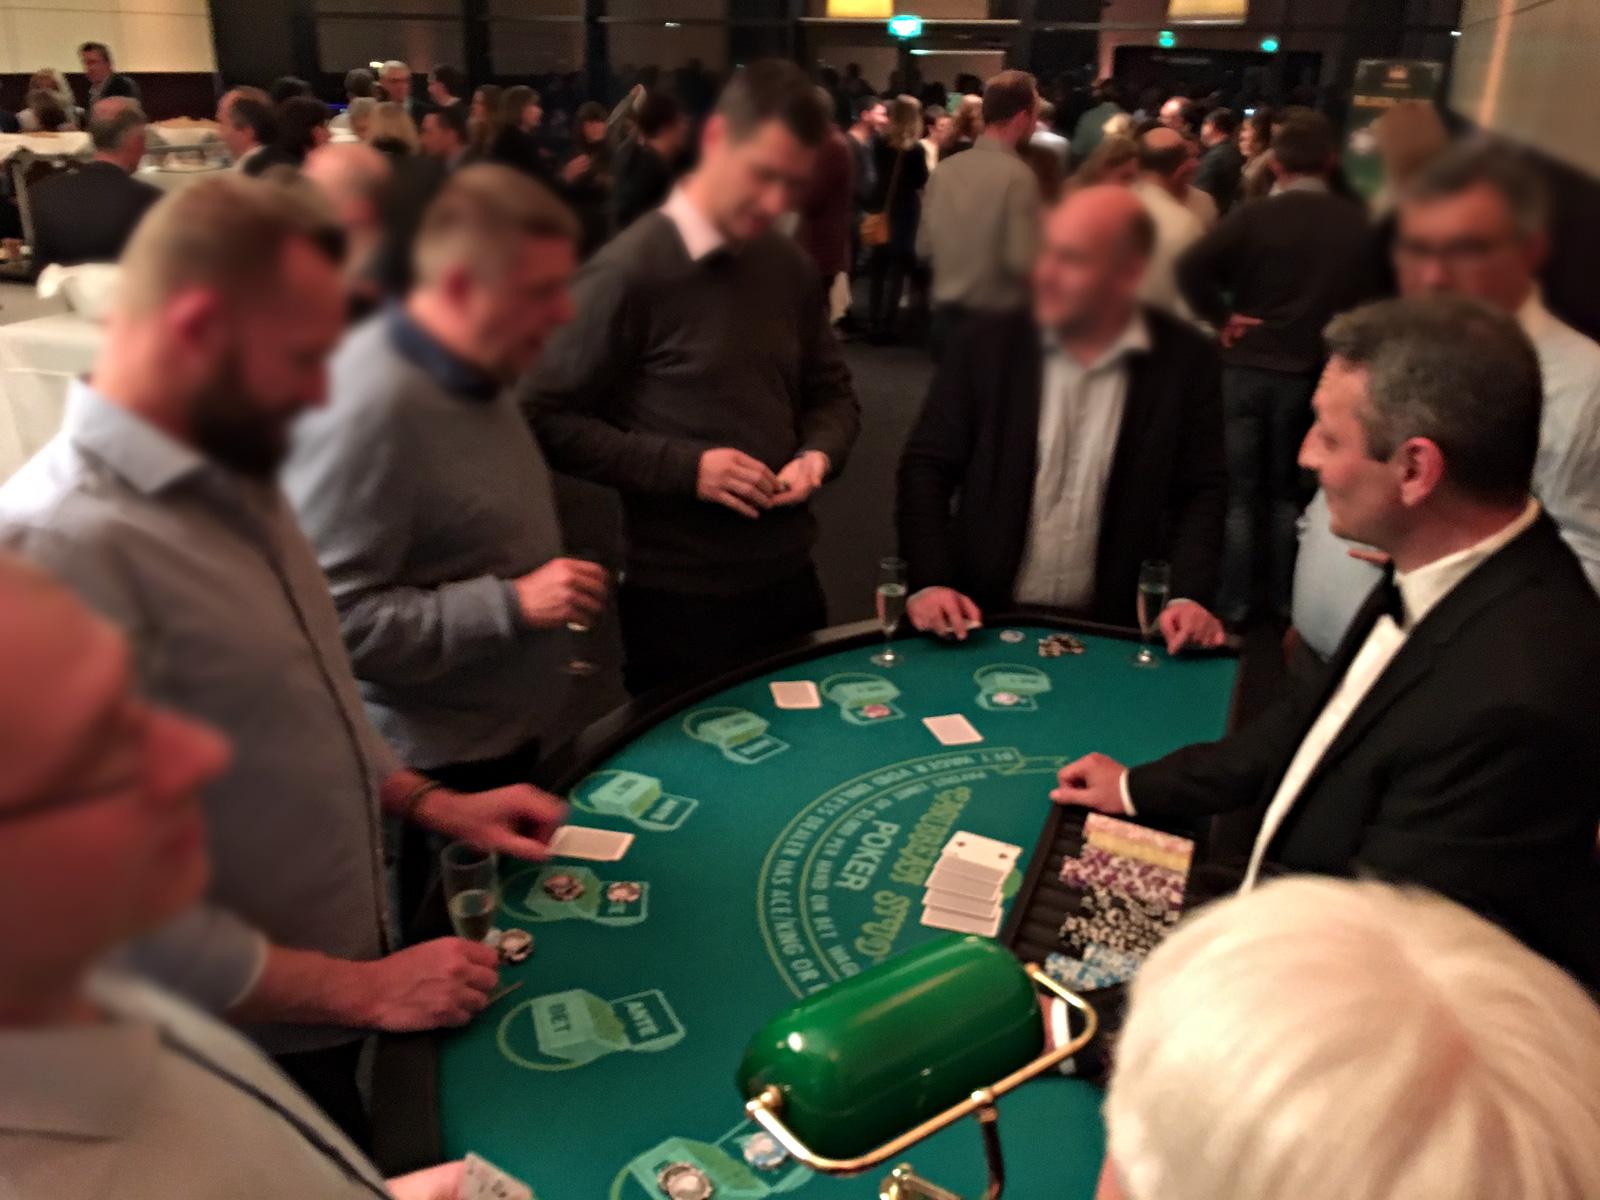 Soirée casino Animation, casino Roulette